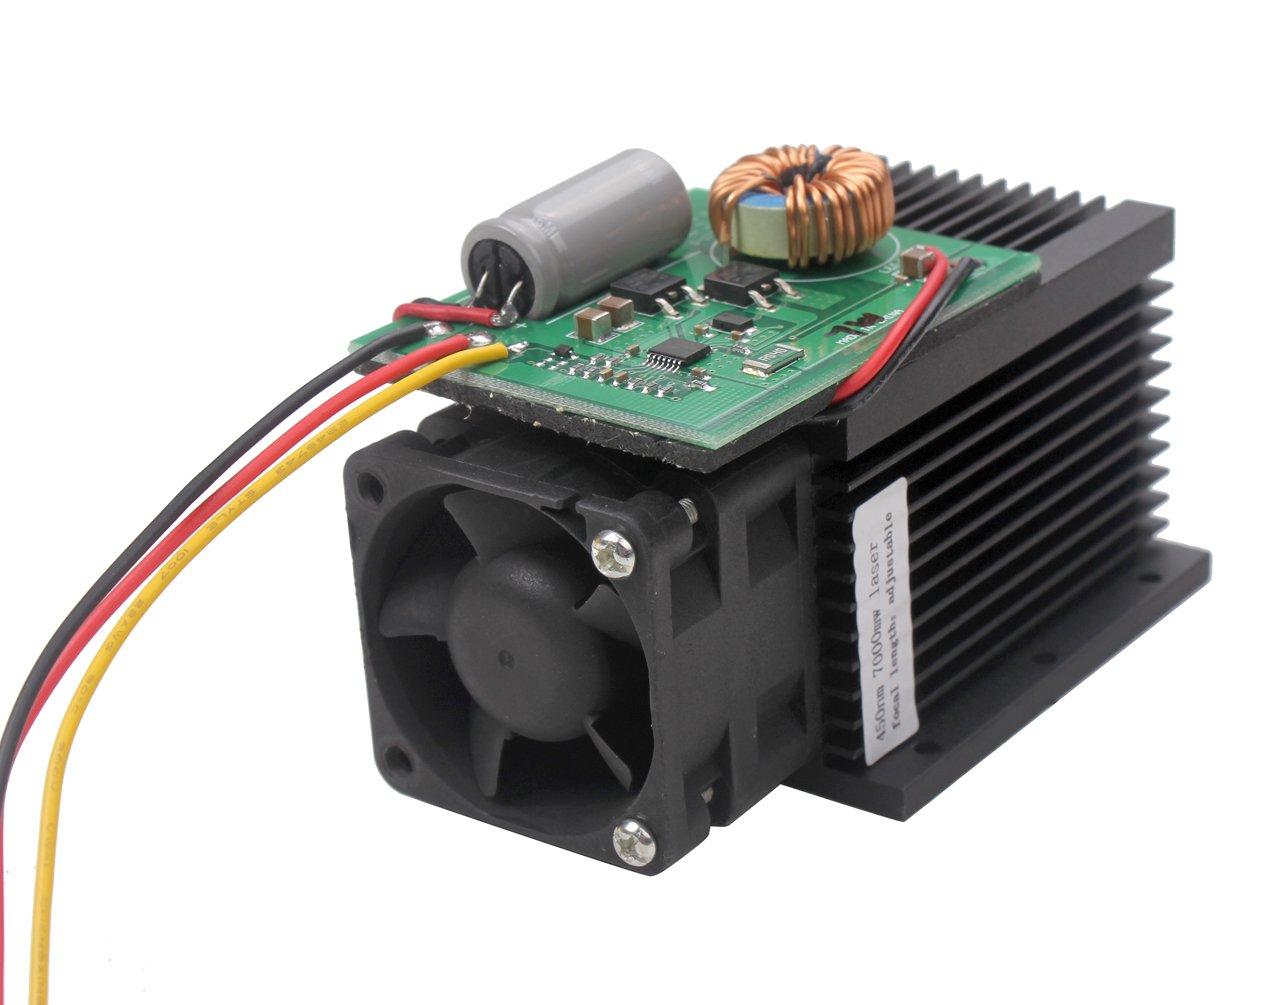 SUNWIN Universal Laser Module Head 7W 7000MW Blue Light 450nm For DIY Laser Engraver